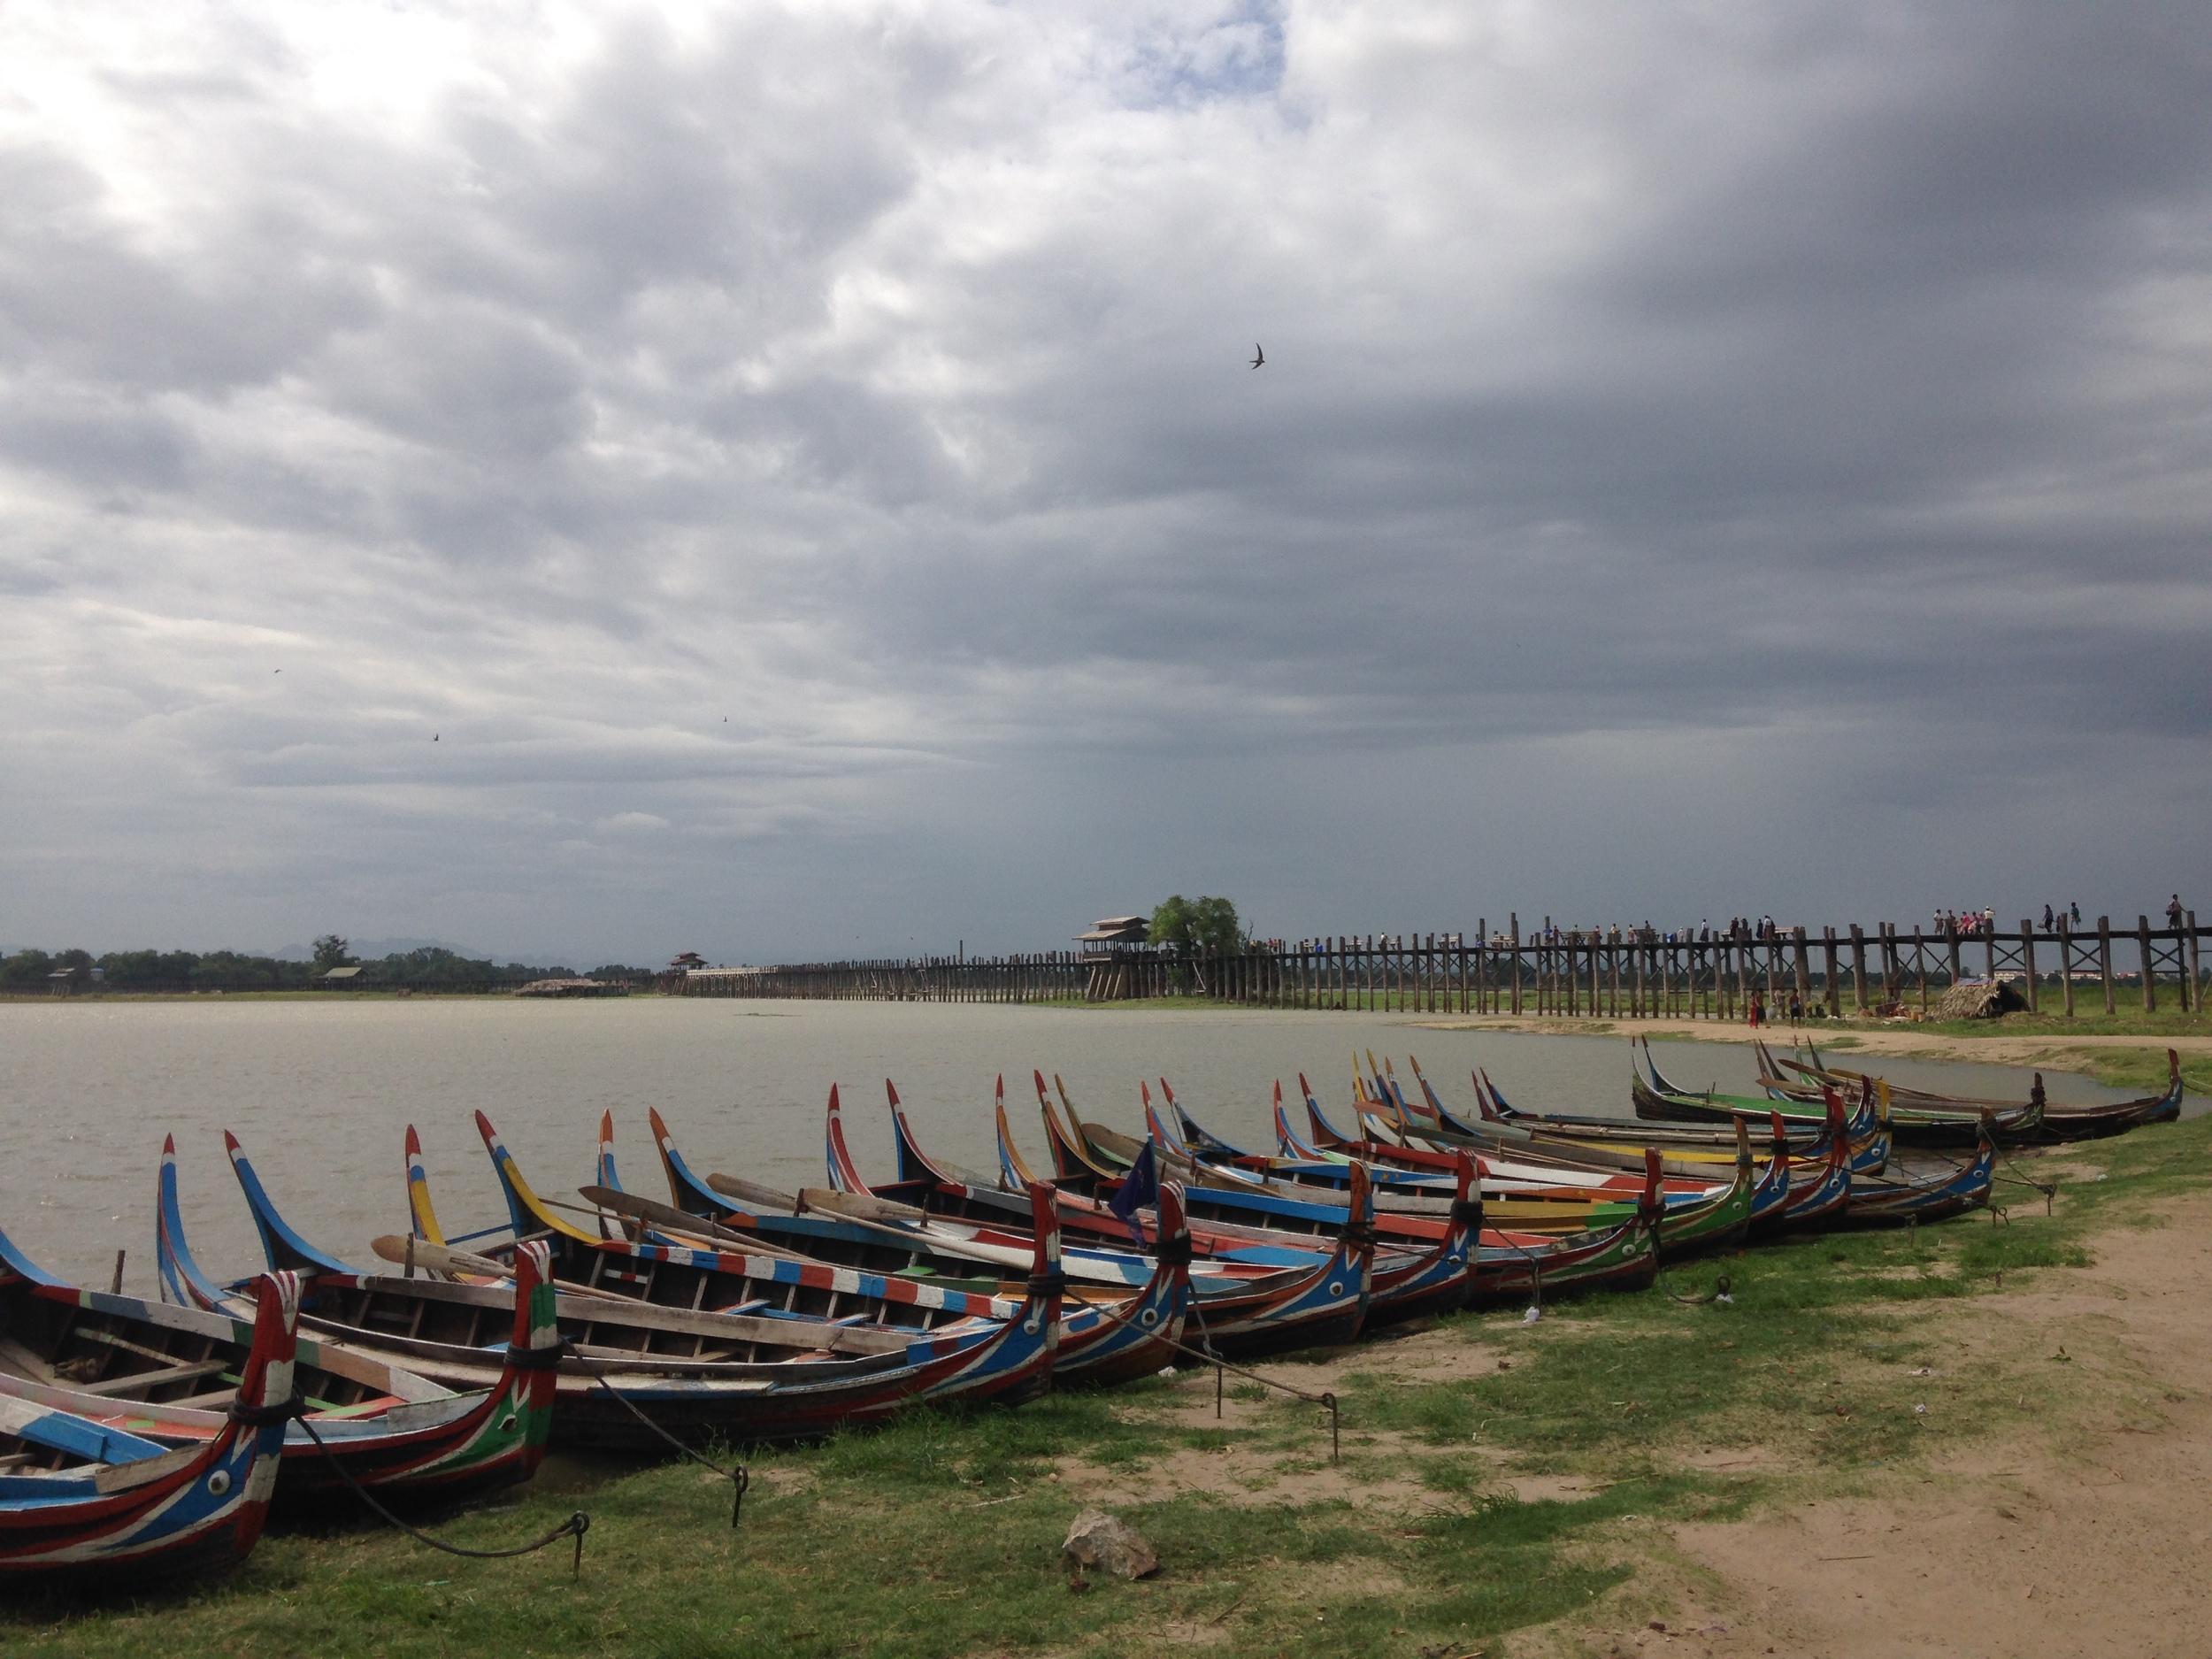 Boats in front of the U Bein Bridge near Mandalay